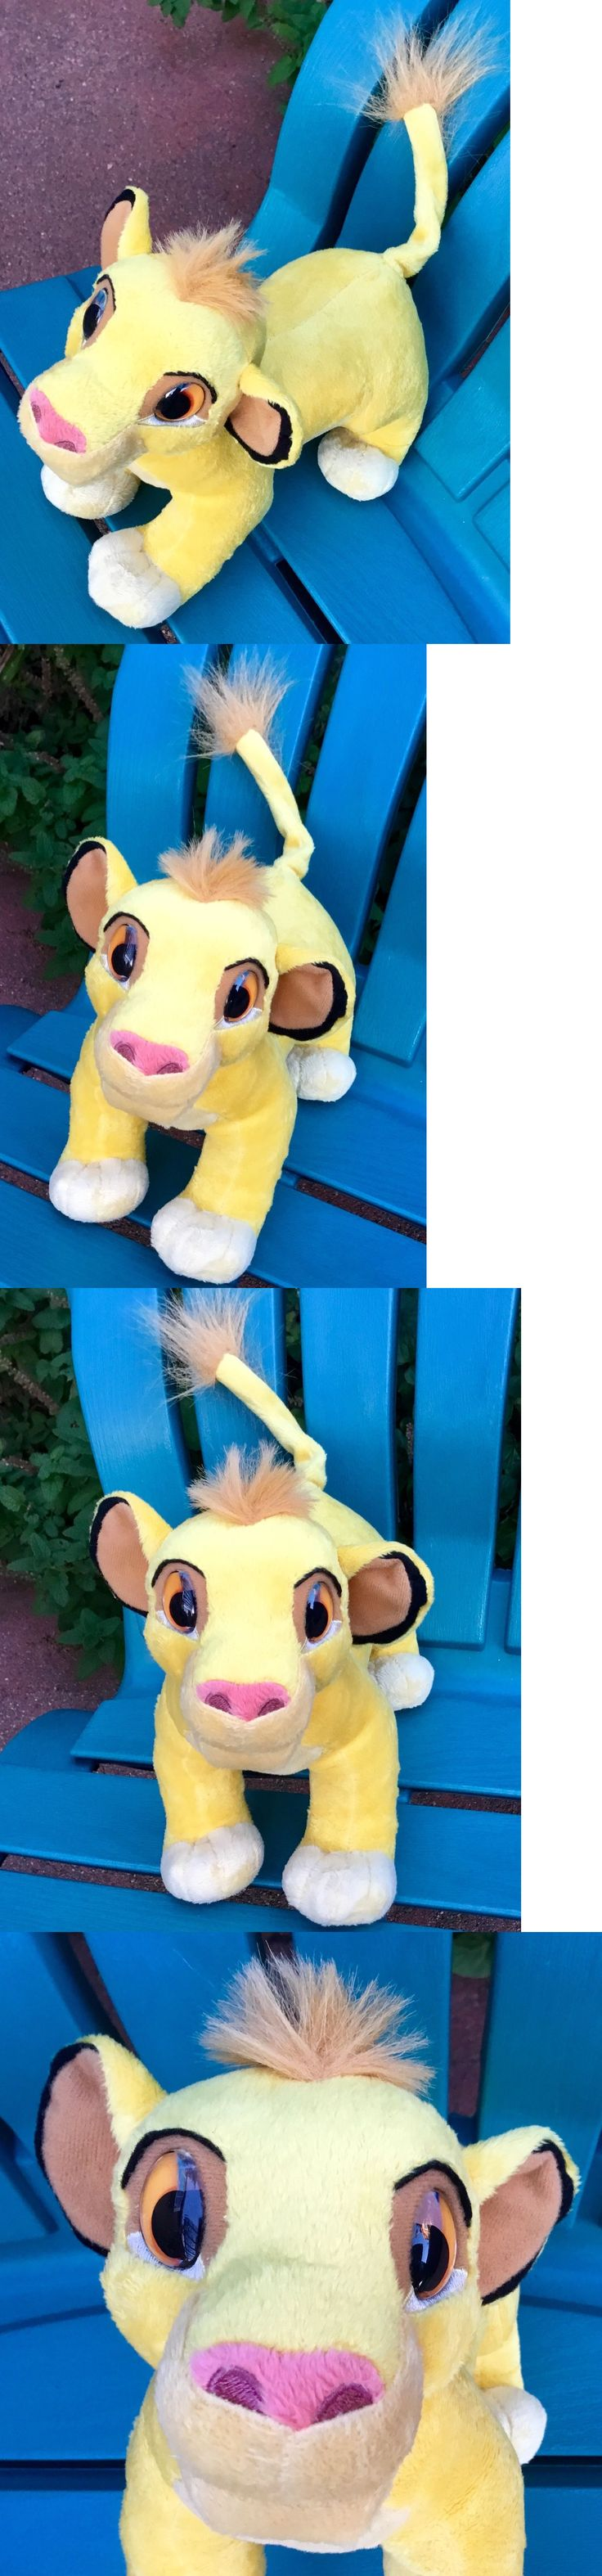 Lion King 44037: New Singing Talking Disney Real Eyes Simba Lion King Cub Plush Head Moves Talks! -> BUY IT NOW ONLY: $55.99 on eBay!